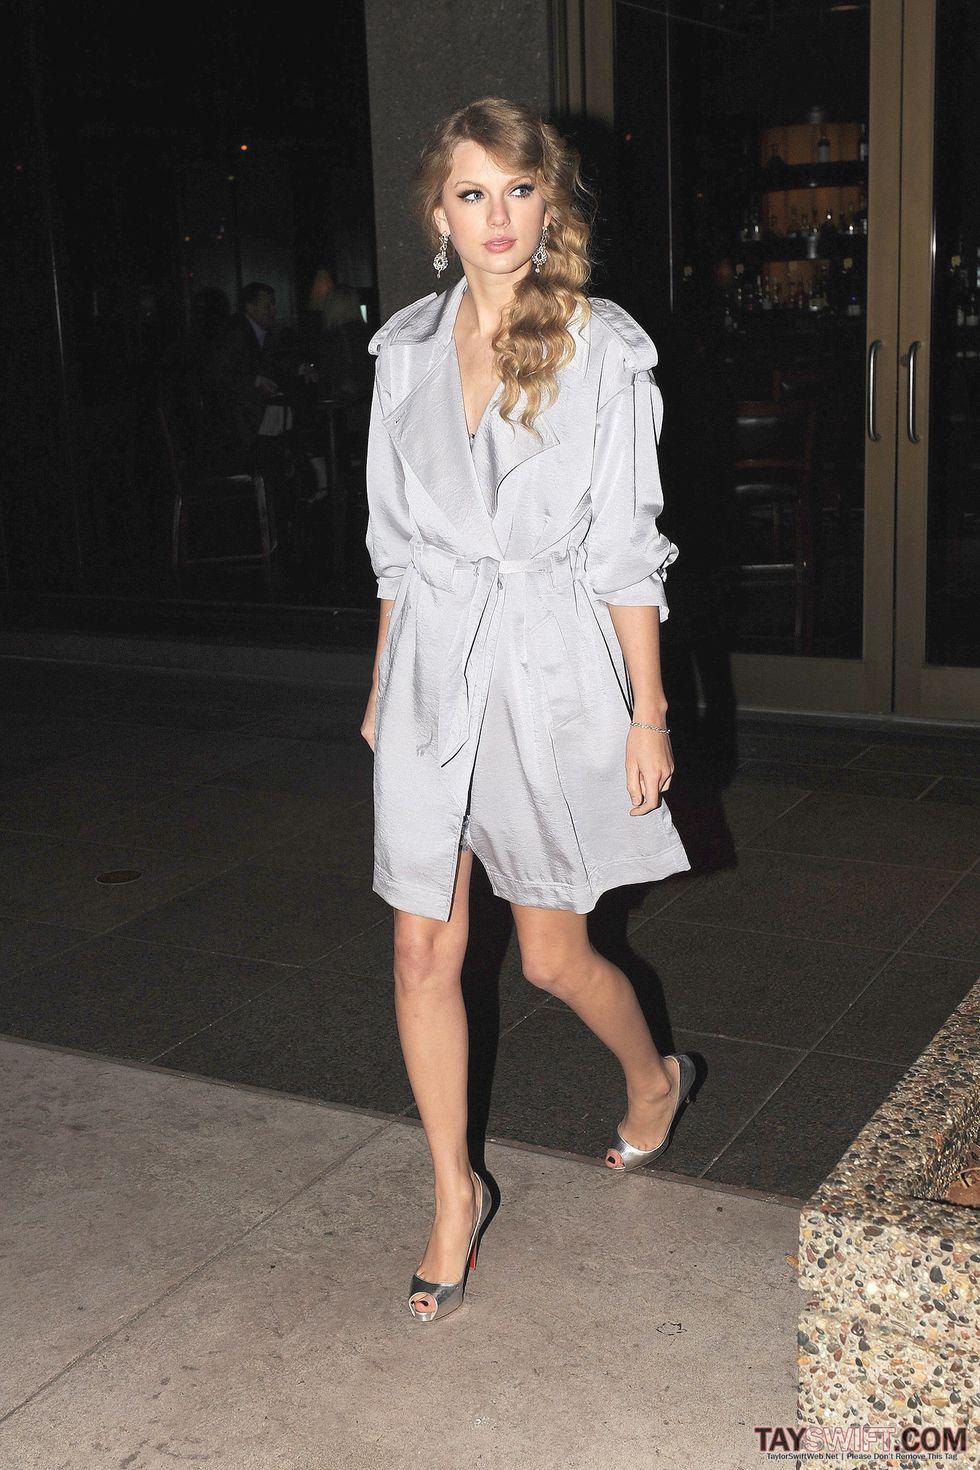 Taylor Swift 2010 : taylor-swift-leaving-del-friscos-restaurant-in-ny-04-05-2010-hq-x10-legtastic-10